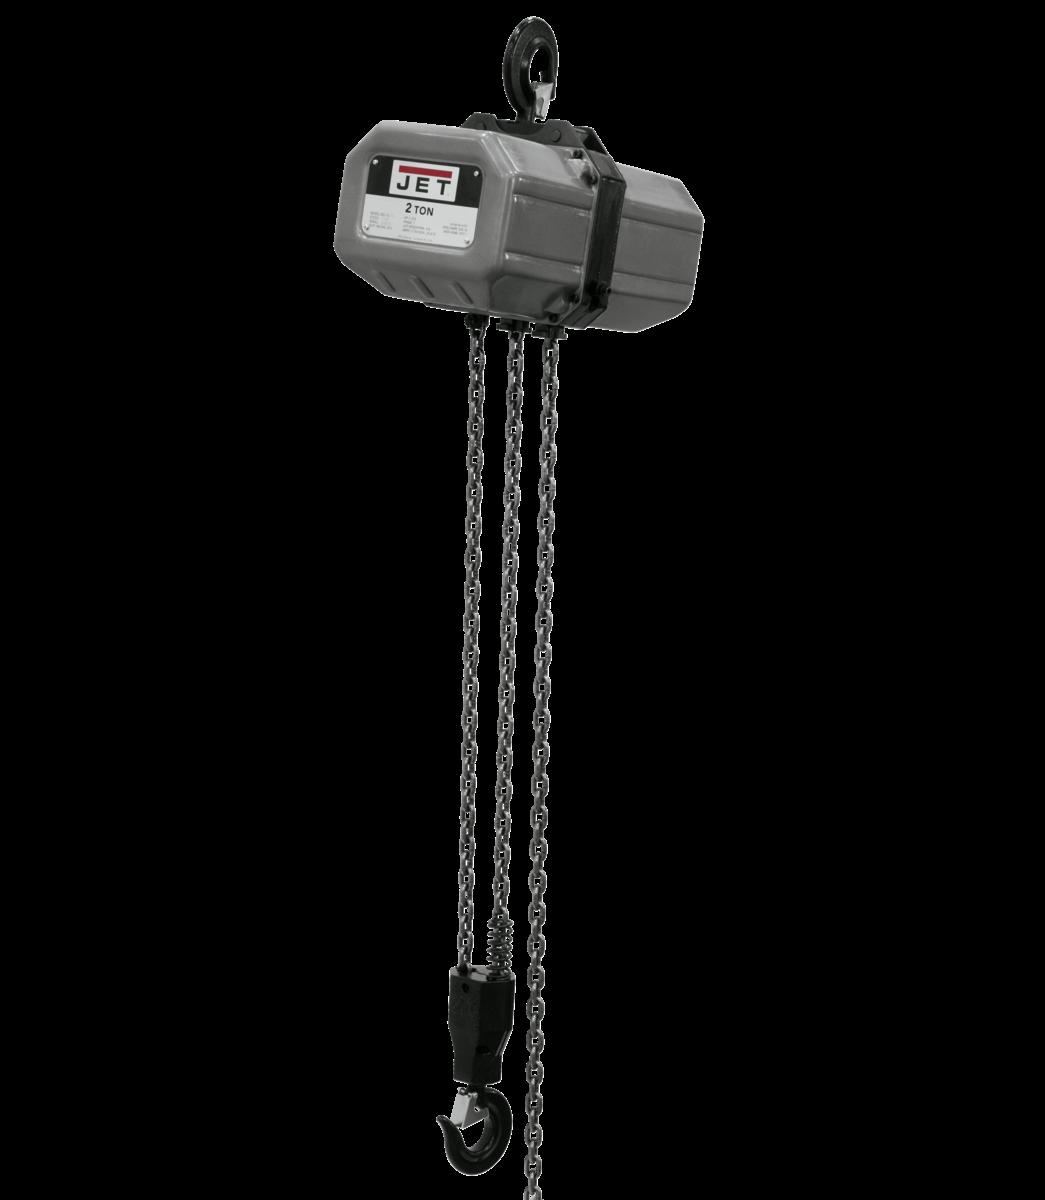 2SS-1C-10, 2-Ton Electric Chain Hoist 1-Phase 10' Lift